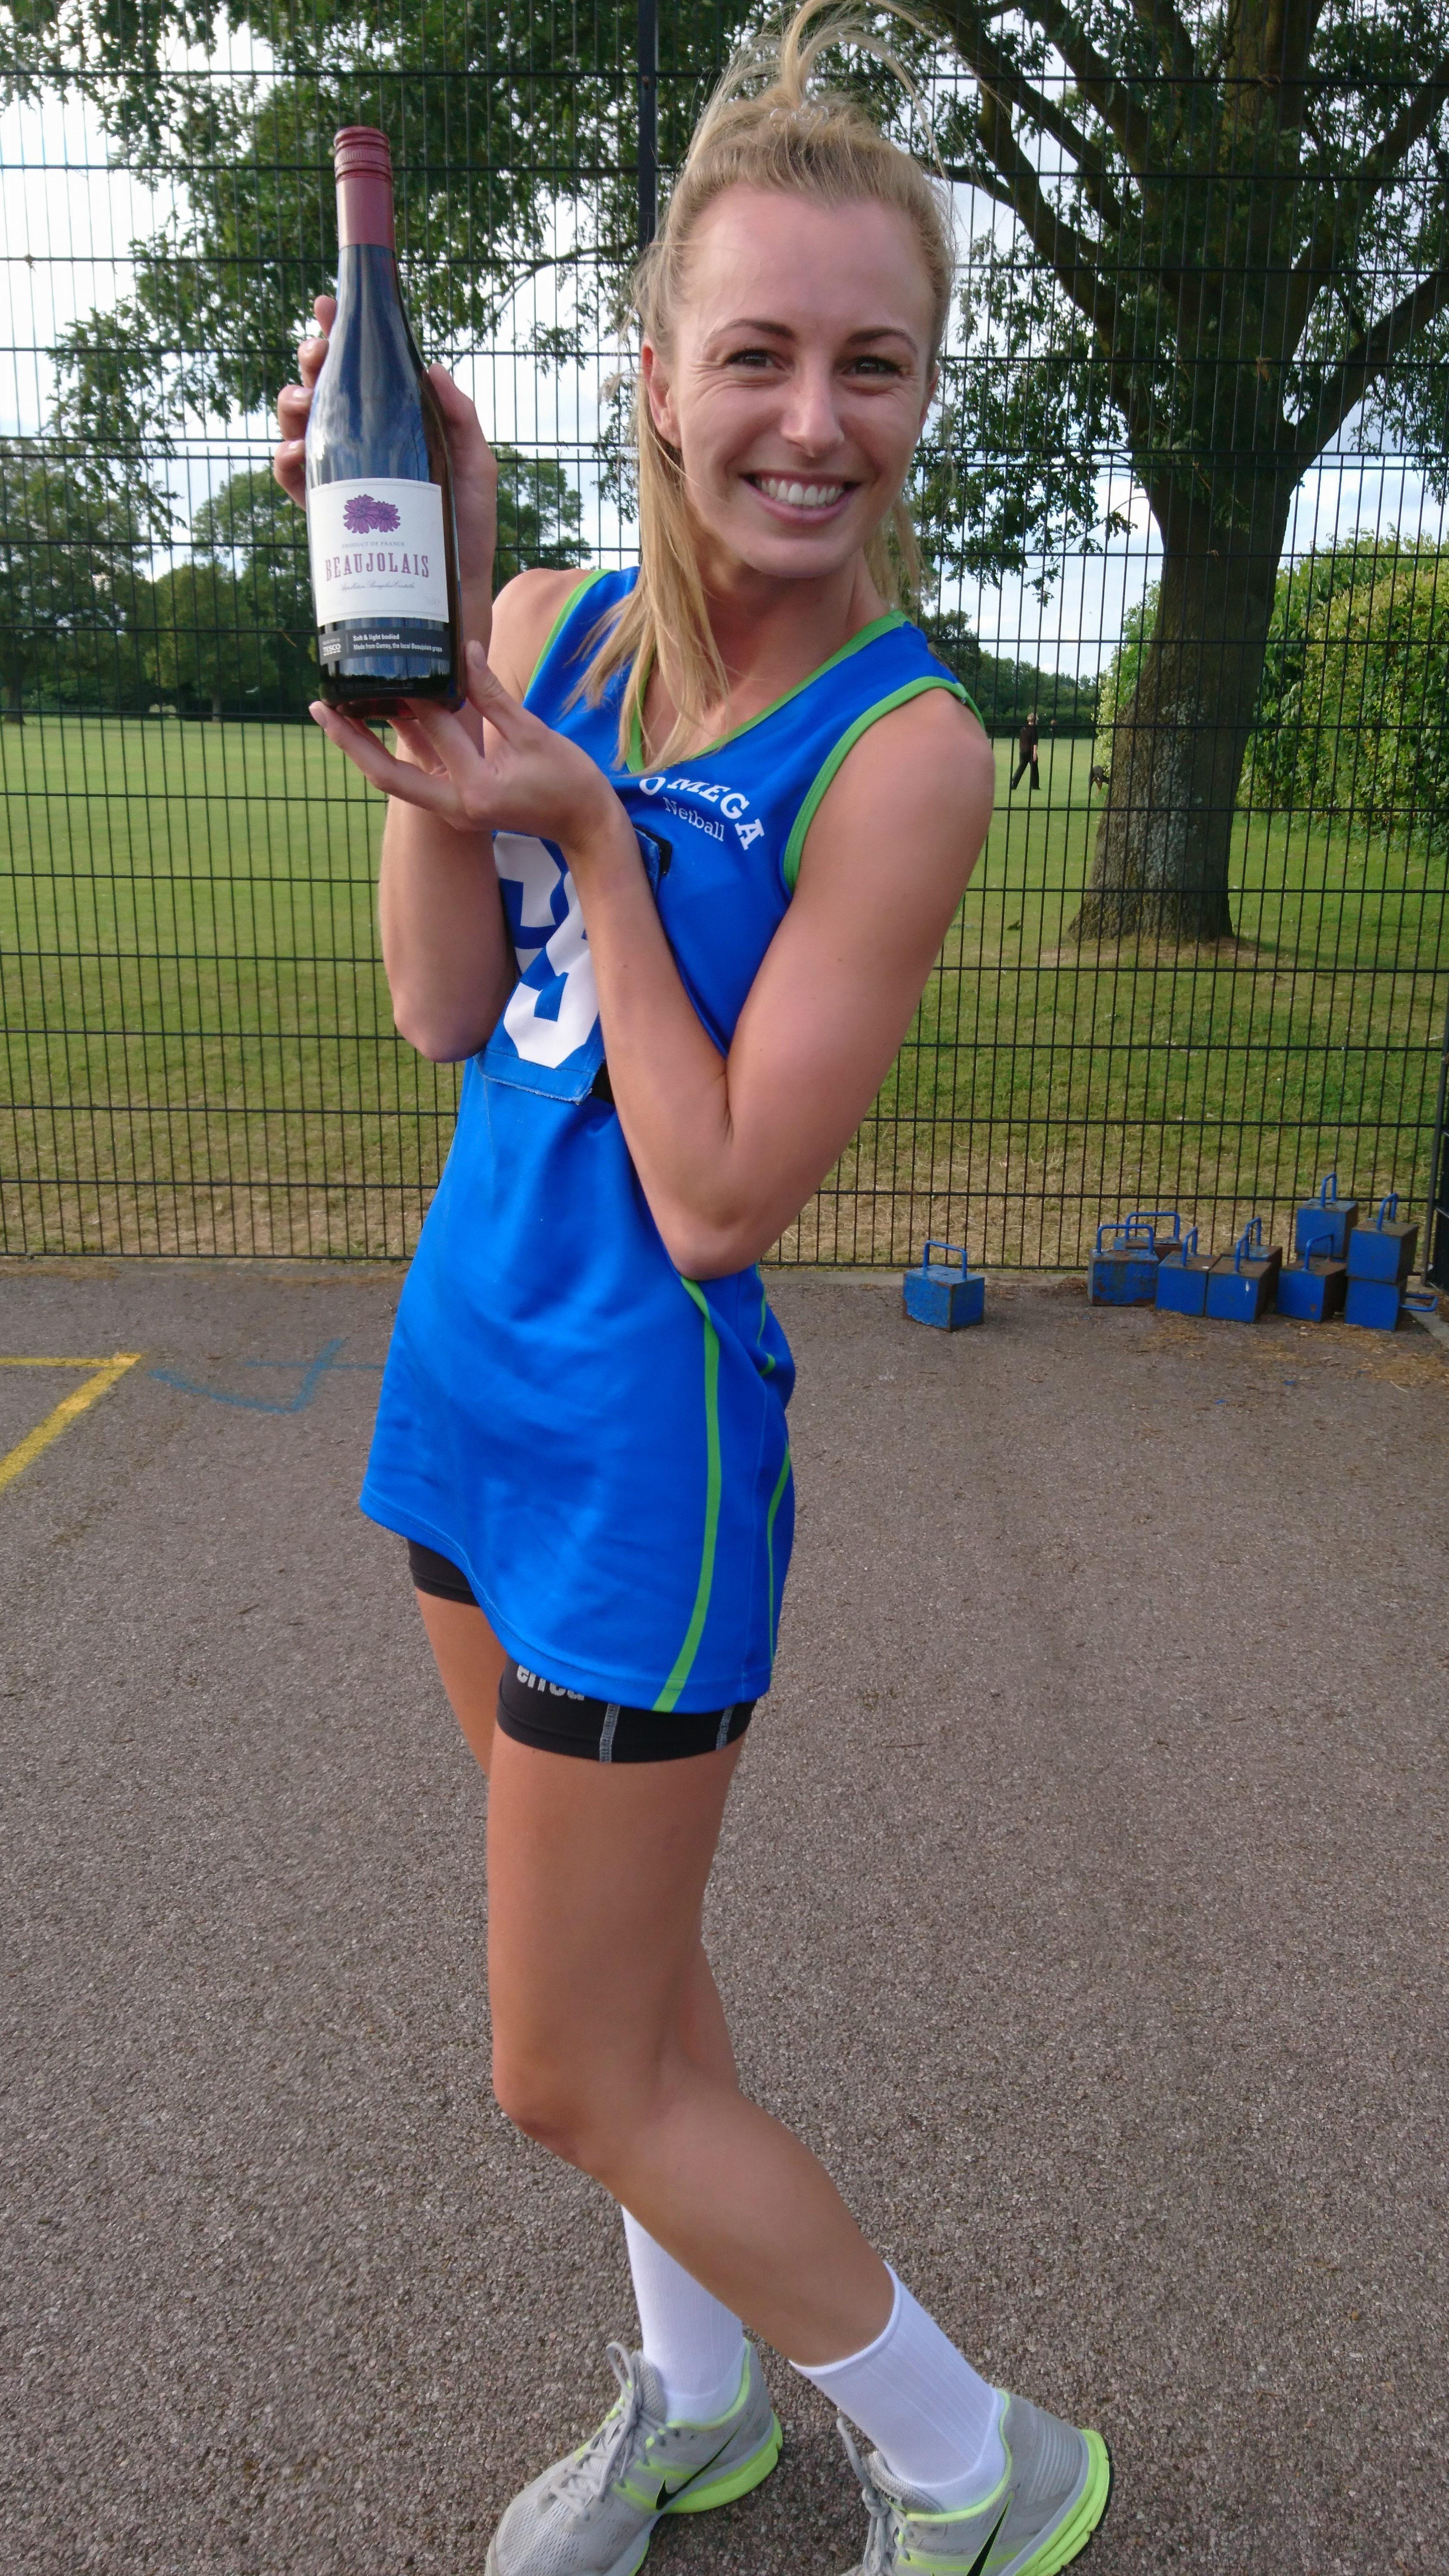 Chloe D'Arcy - C Team Player's Player 2017/18